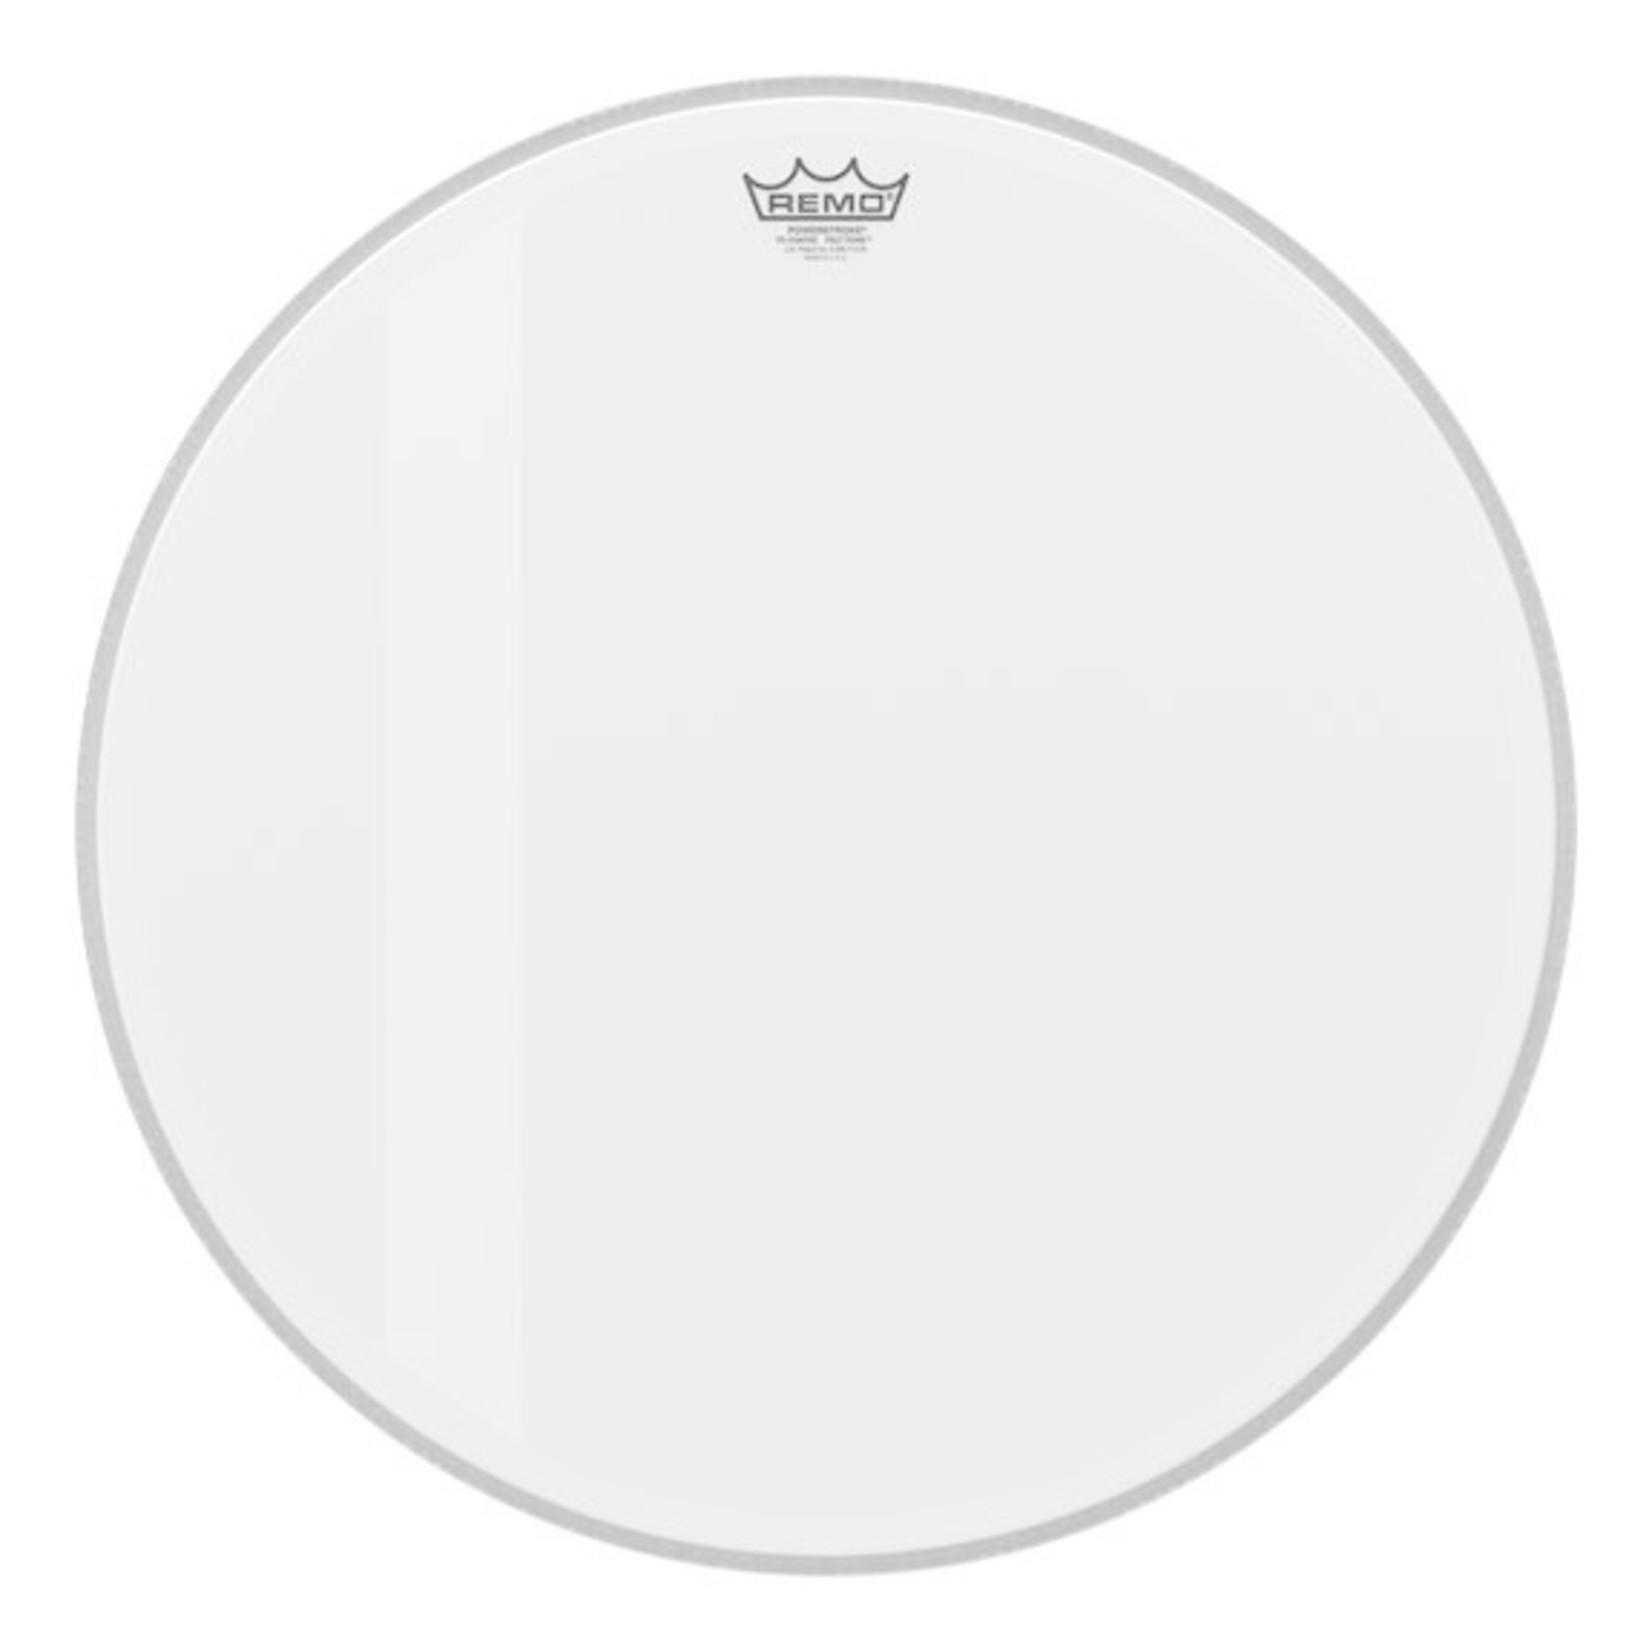 Remo Remo Clear Powerstroke 3 Feltone Bass Drum